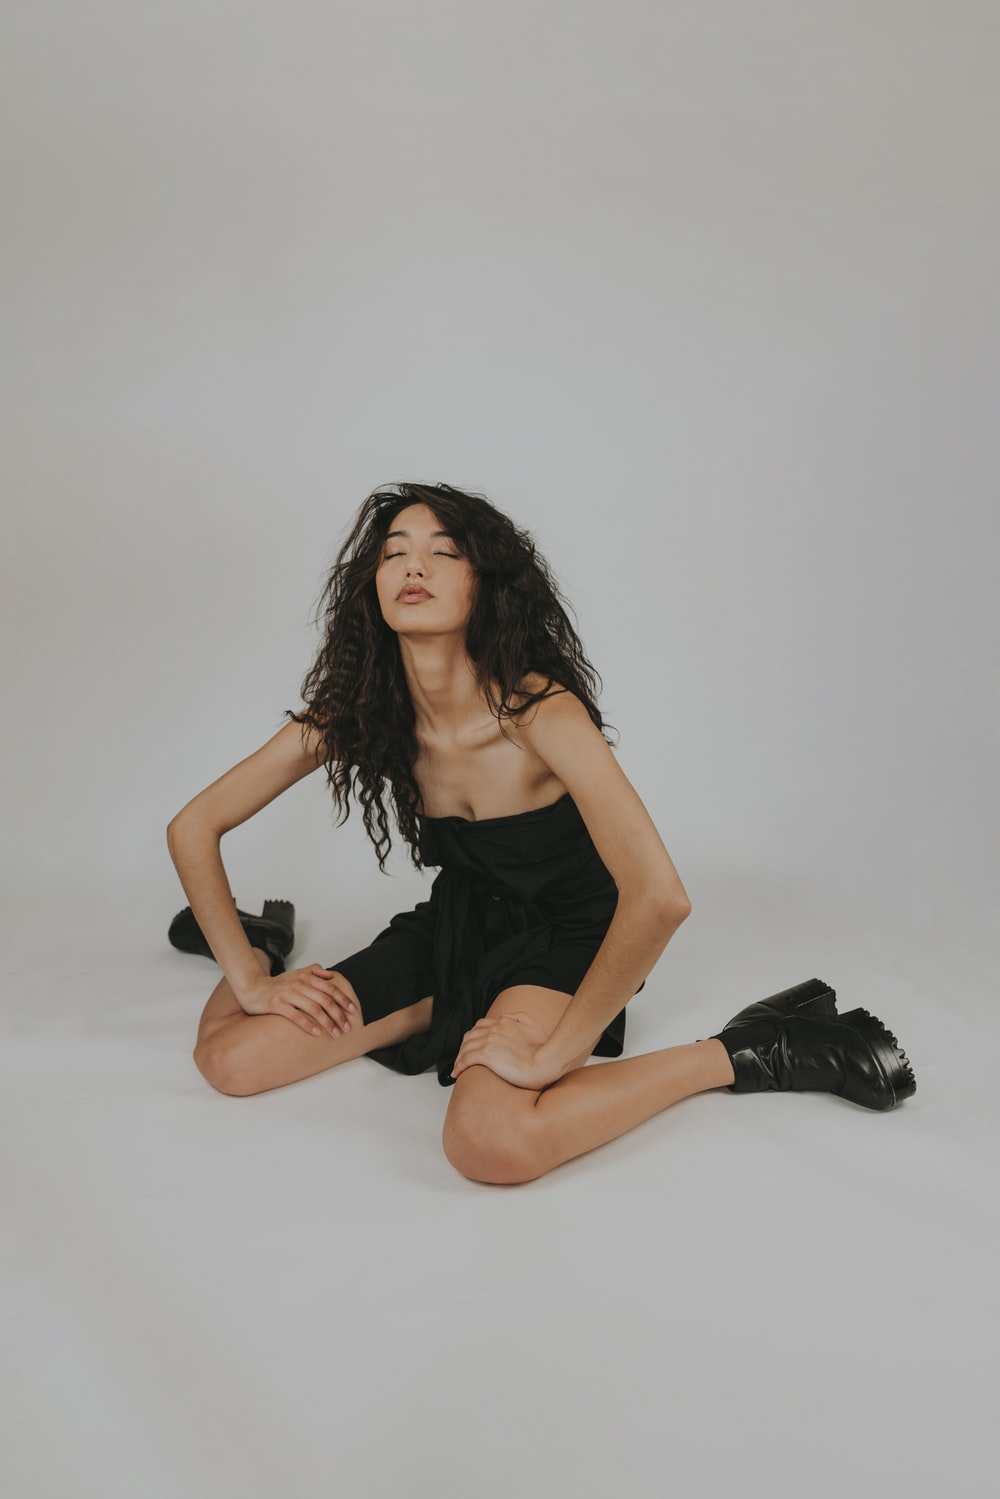 woman in black spaghetti strap dress sitting on white floor